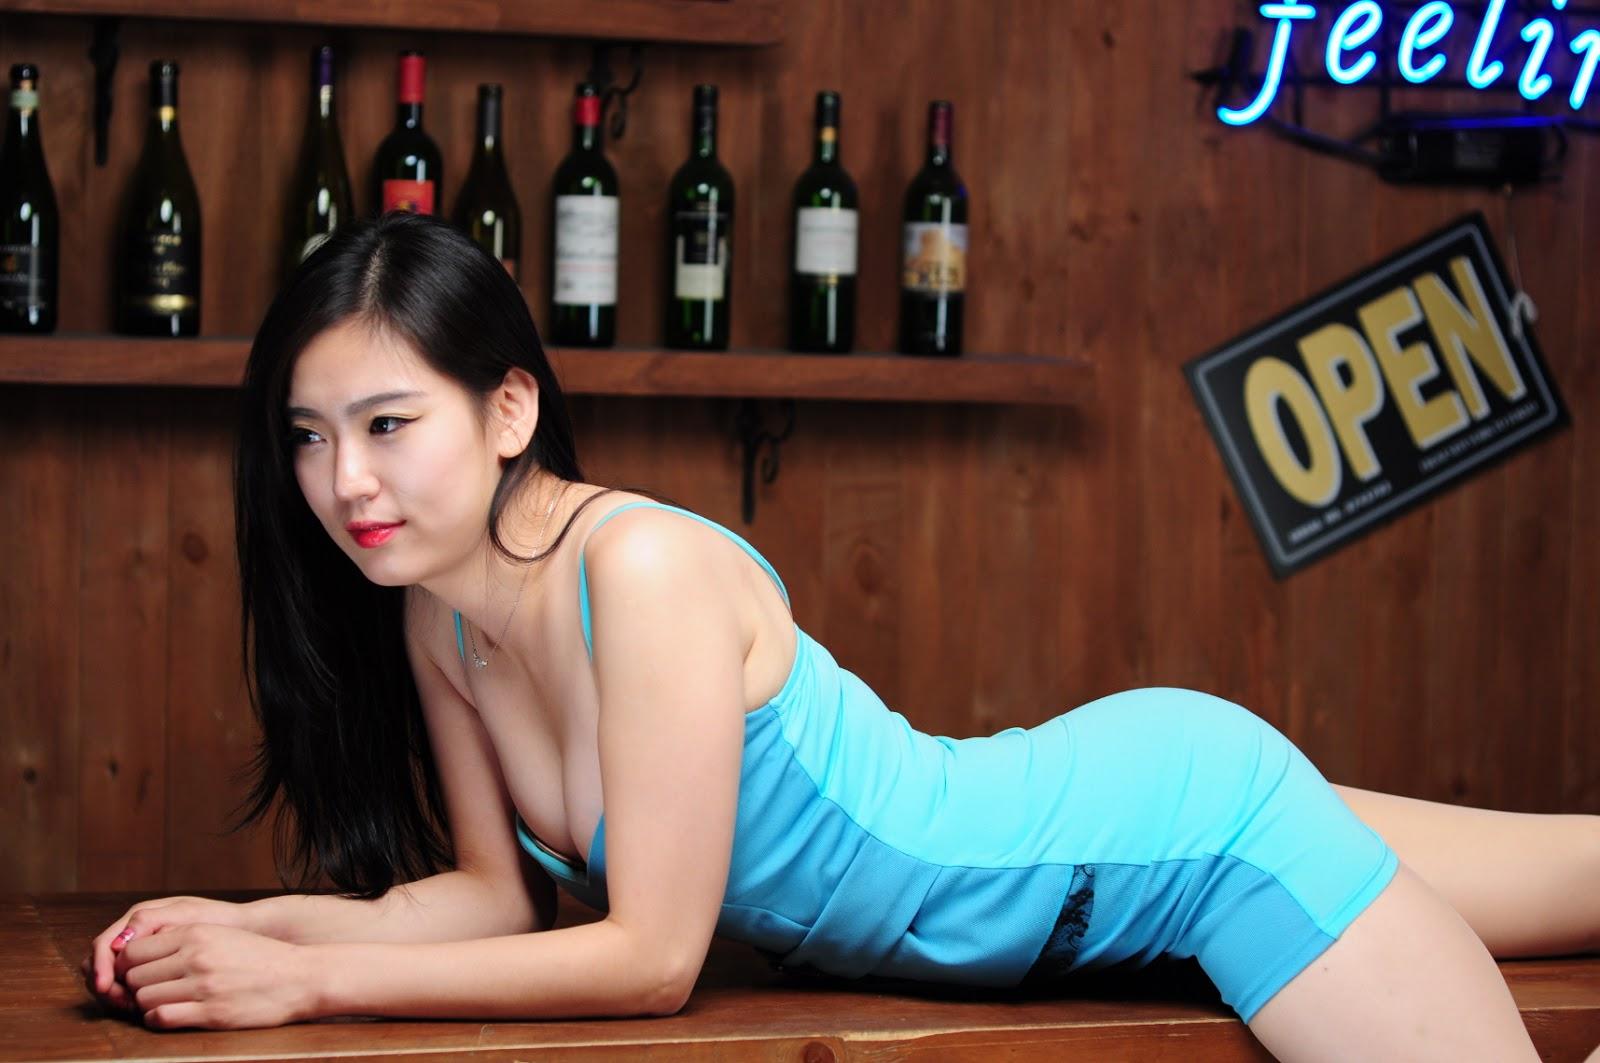 Korean celebrity ha joohee sex scenes love clinic 2015 - 2 part 1